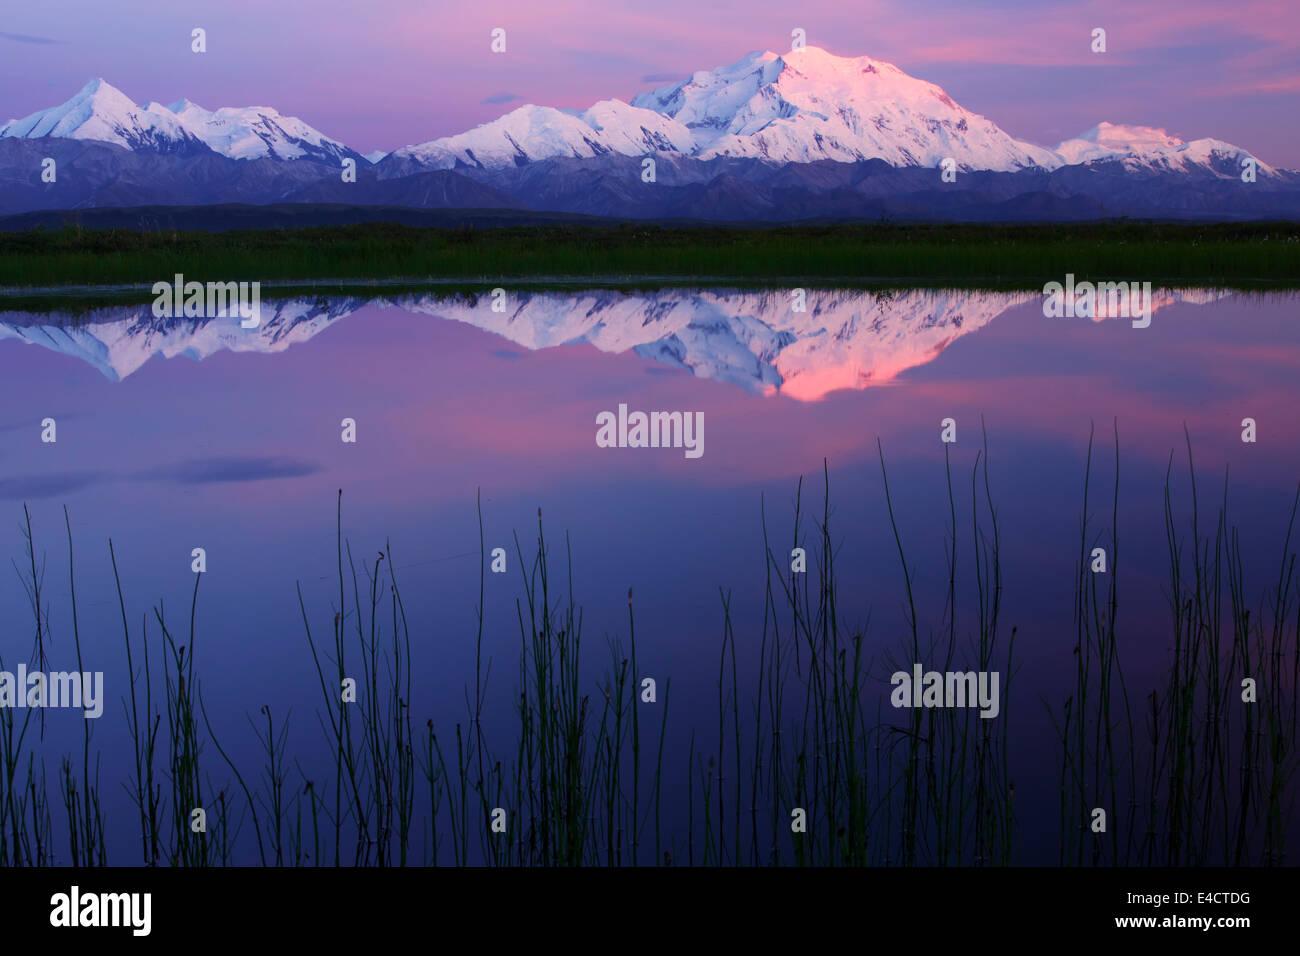 Mt. McKinley, auch bekannt als Denali Denali Nationalpark, Alaska. Stockbild